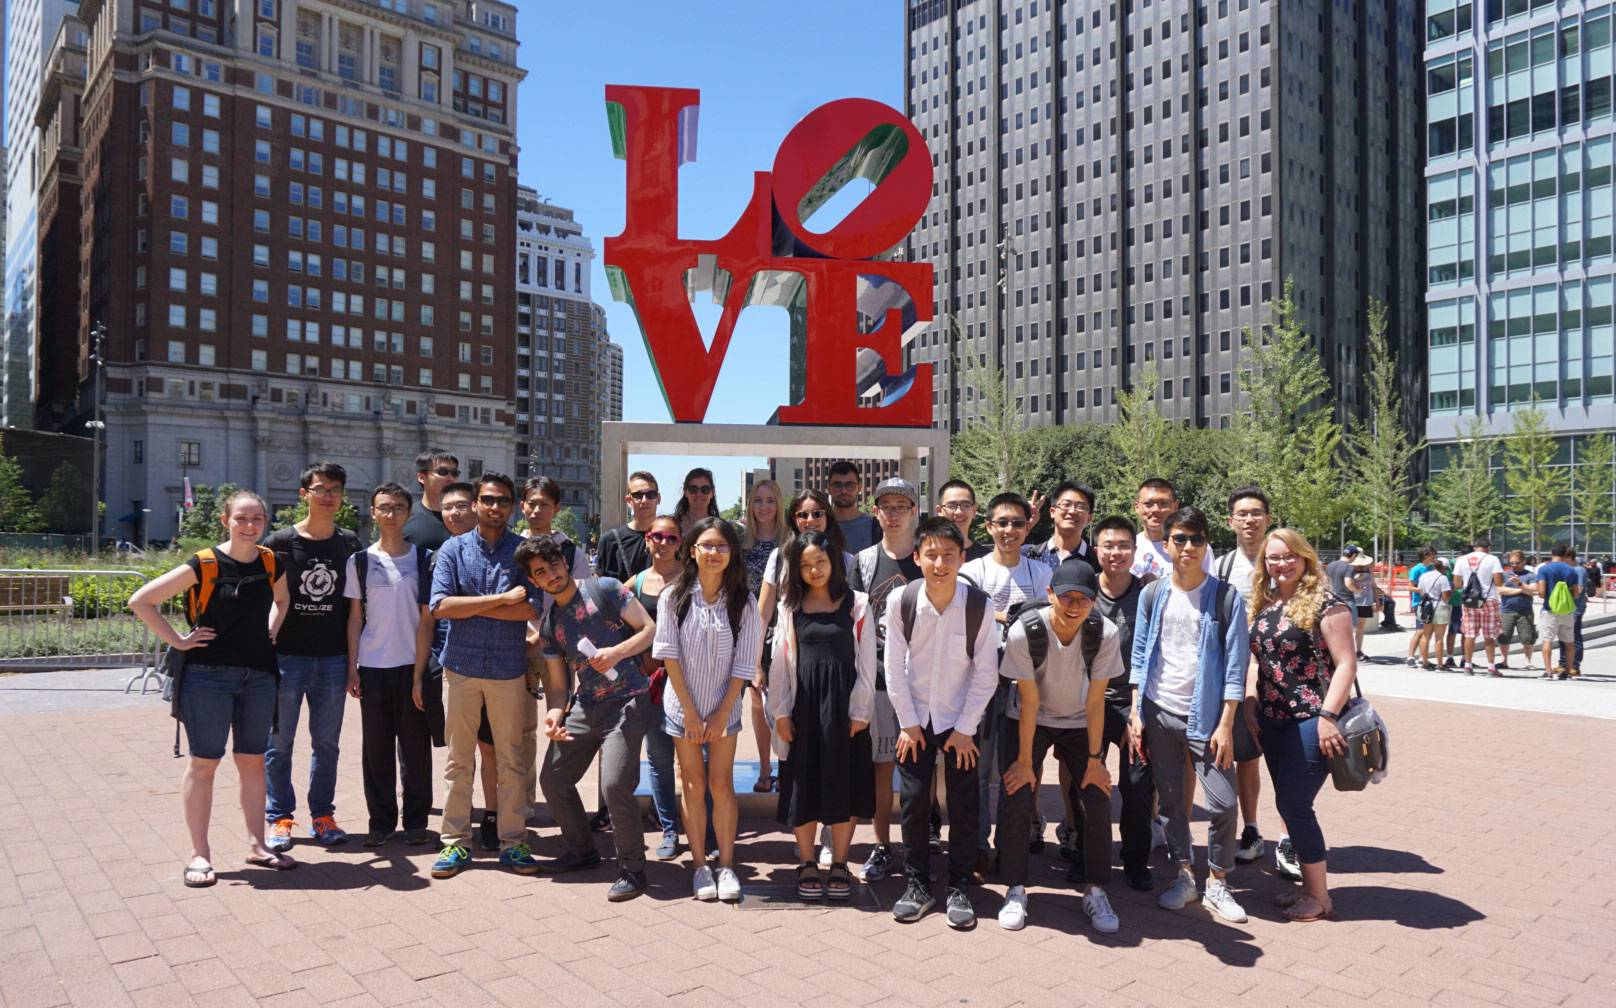 International students standing in front of LOVE statue in Philadelphia